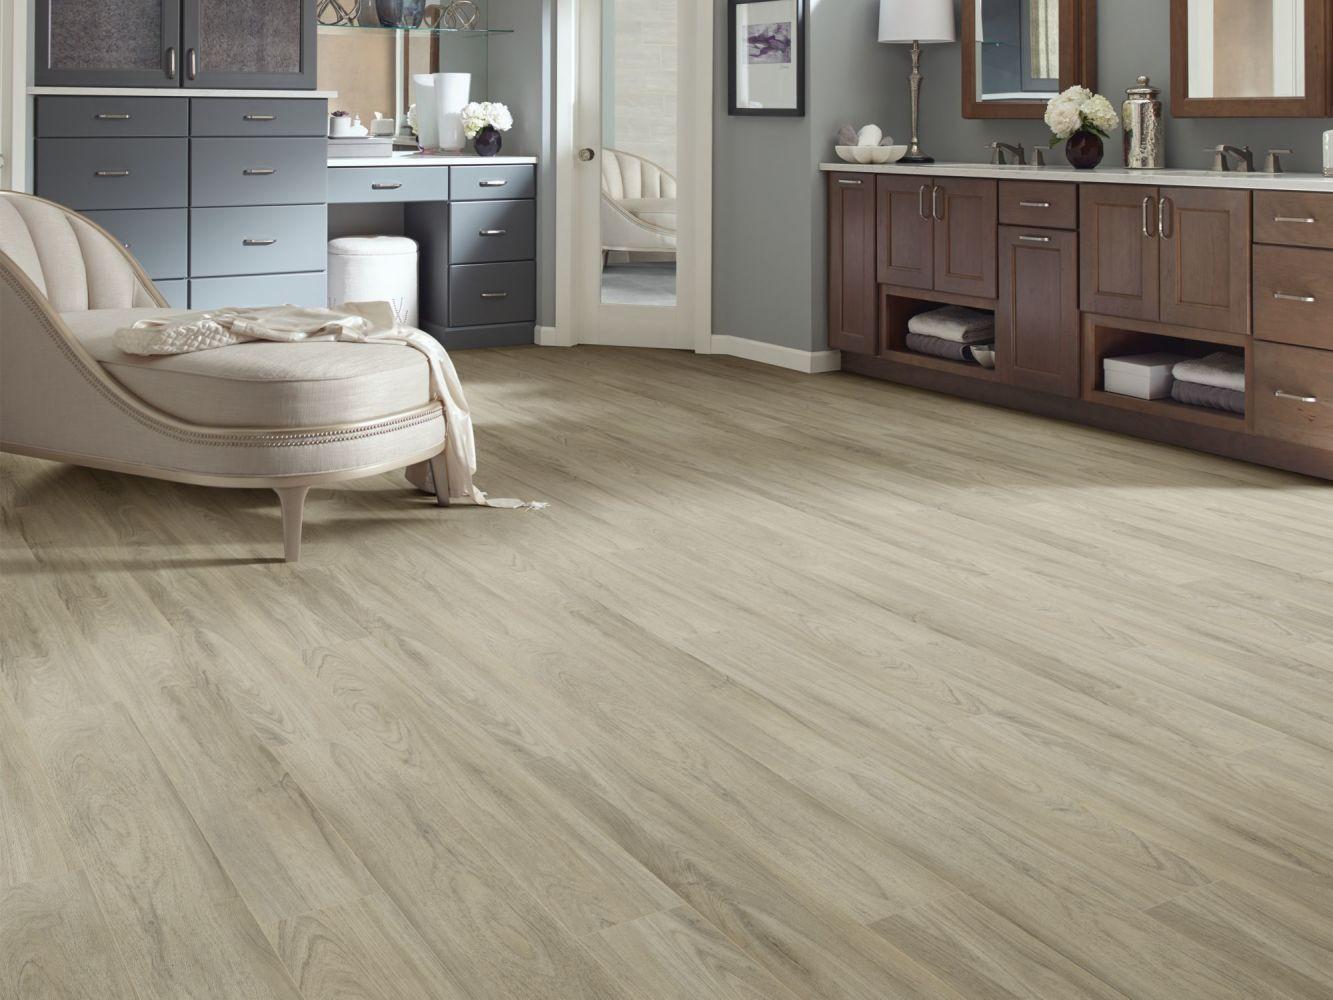 Shaw Floors Resilient Residential Virginia Trail HD Plus Pisa 01027_FR614